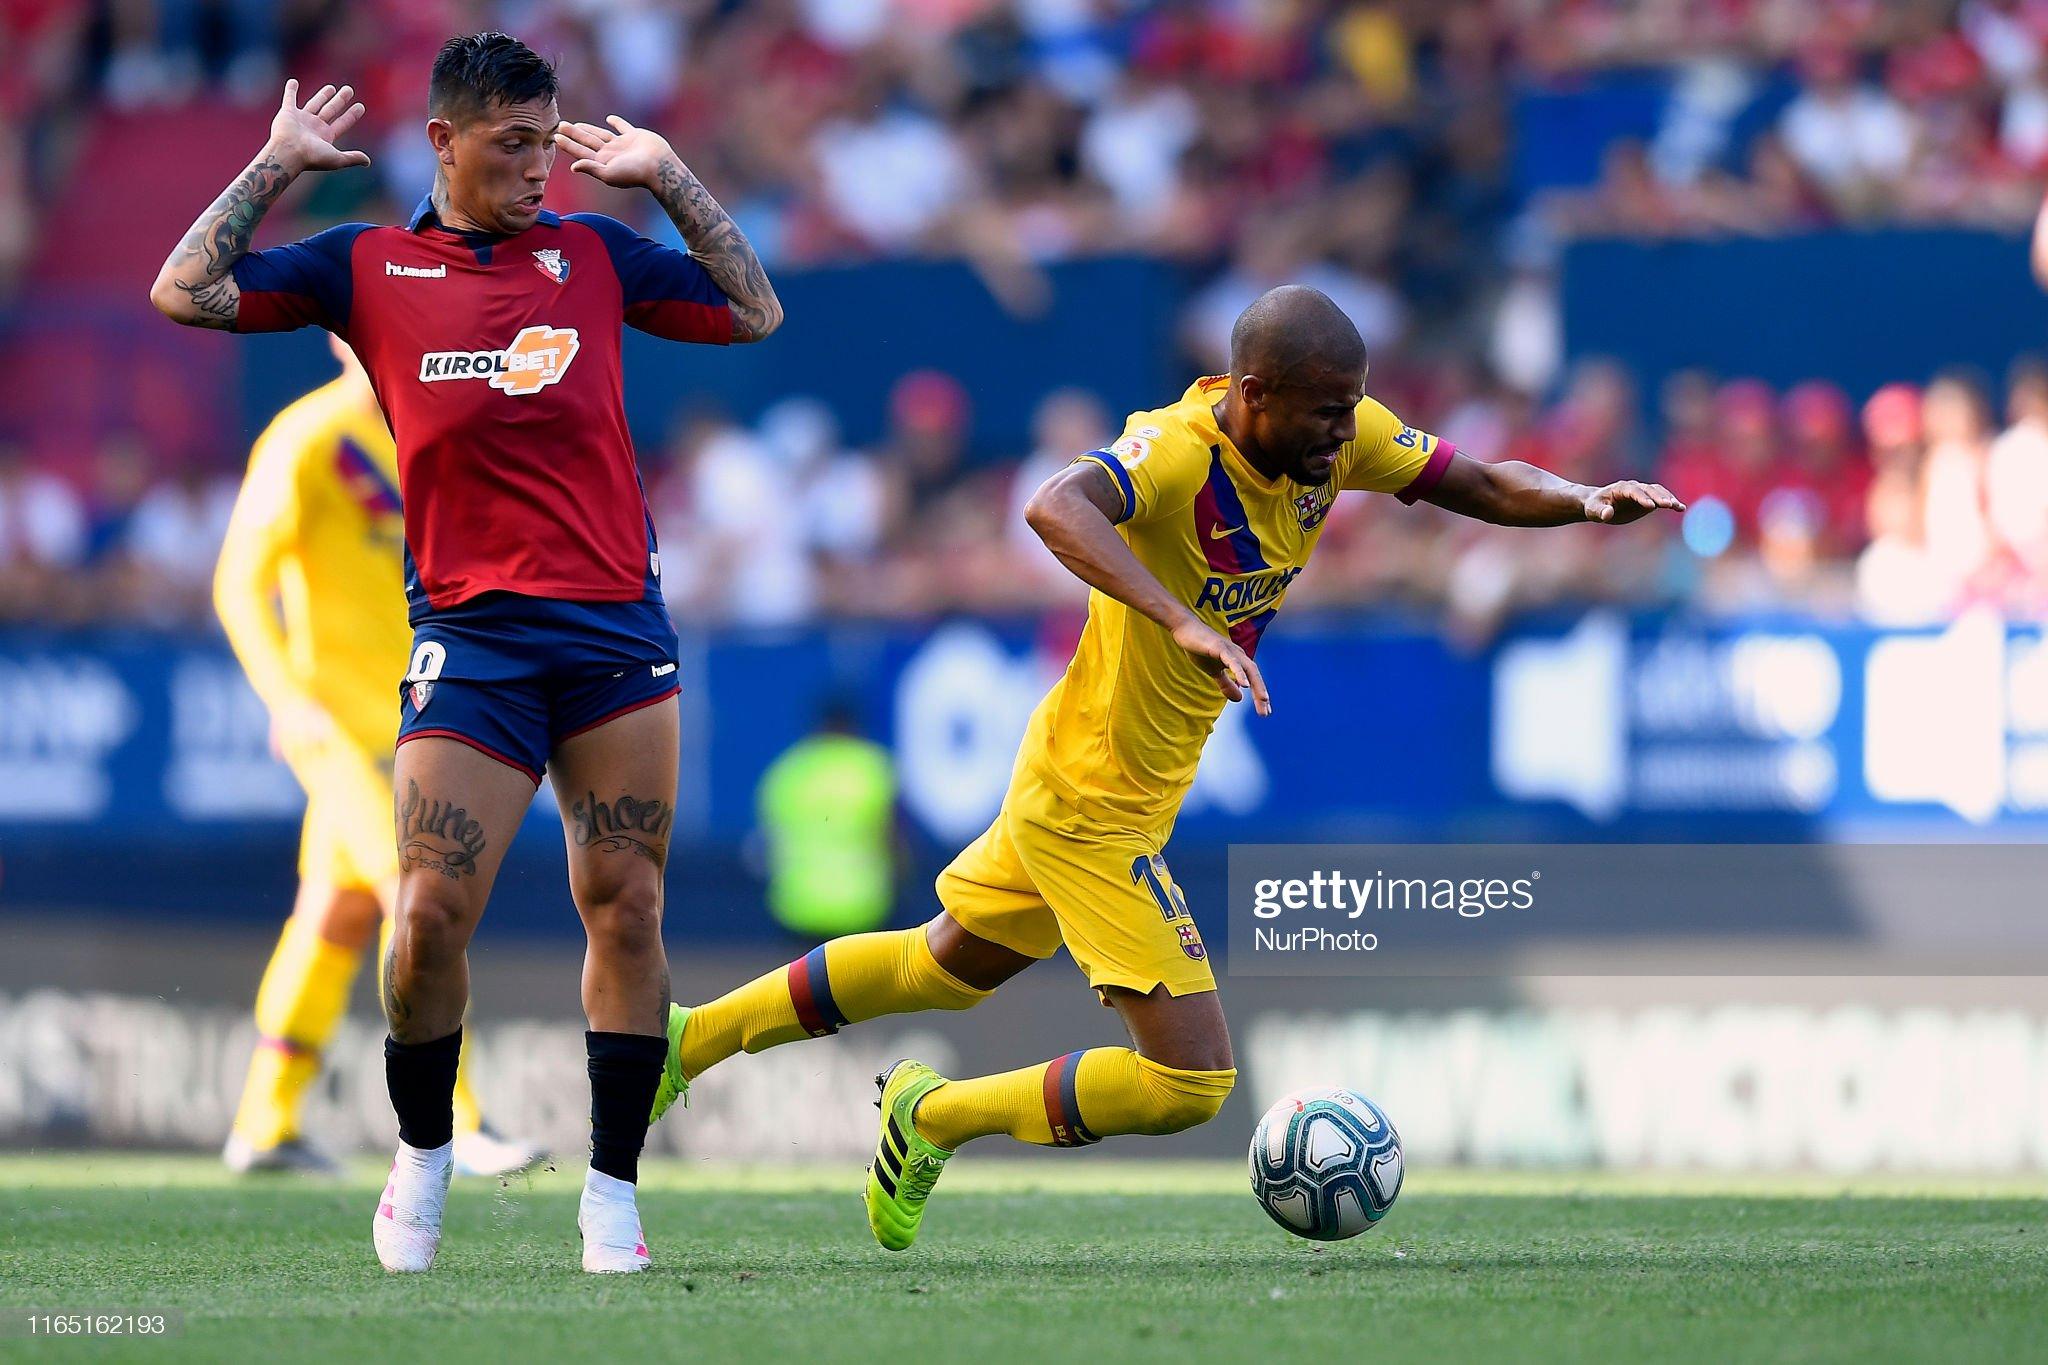 صور مباراة : أوساسونا - برشلونة 2-2 ( 31-08-2019 )  Rafinha-of-barcelona-and-chimy-avila-of-osasuna-competes-for-the-ball-picture-id1165162193?s=2048x2048